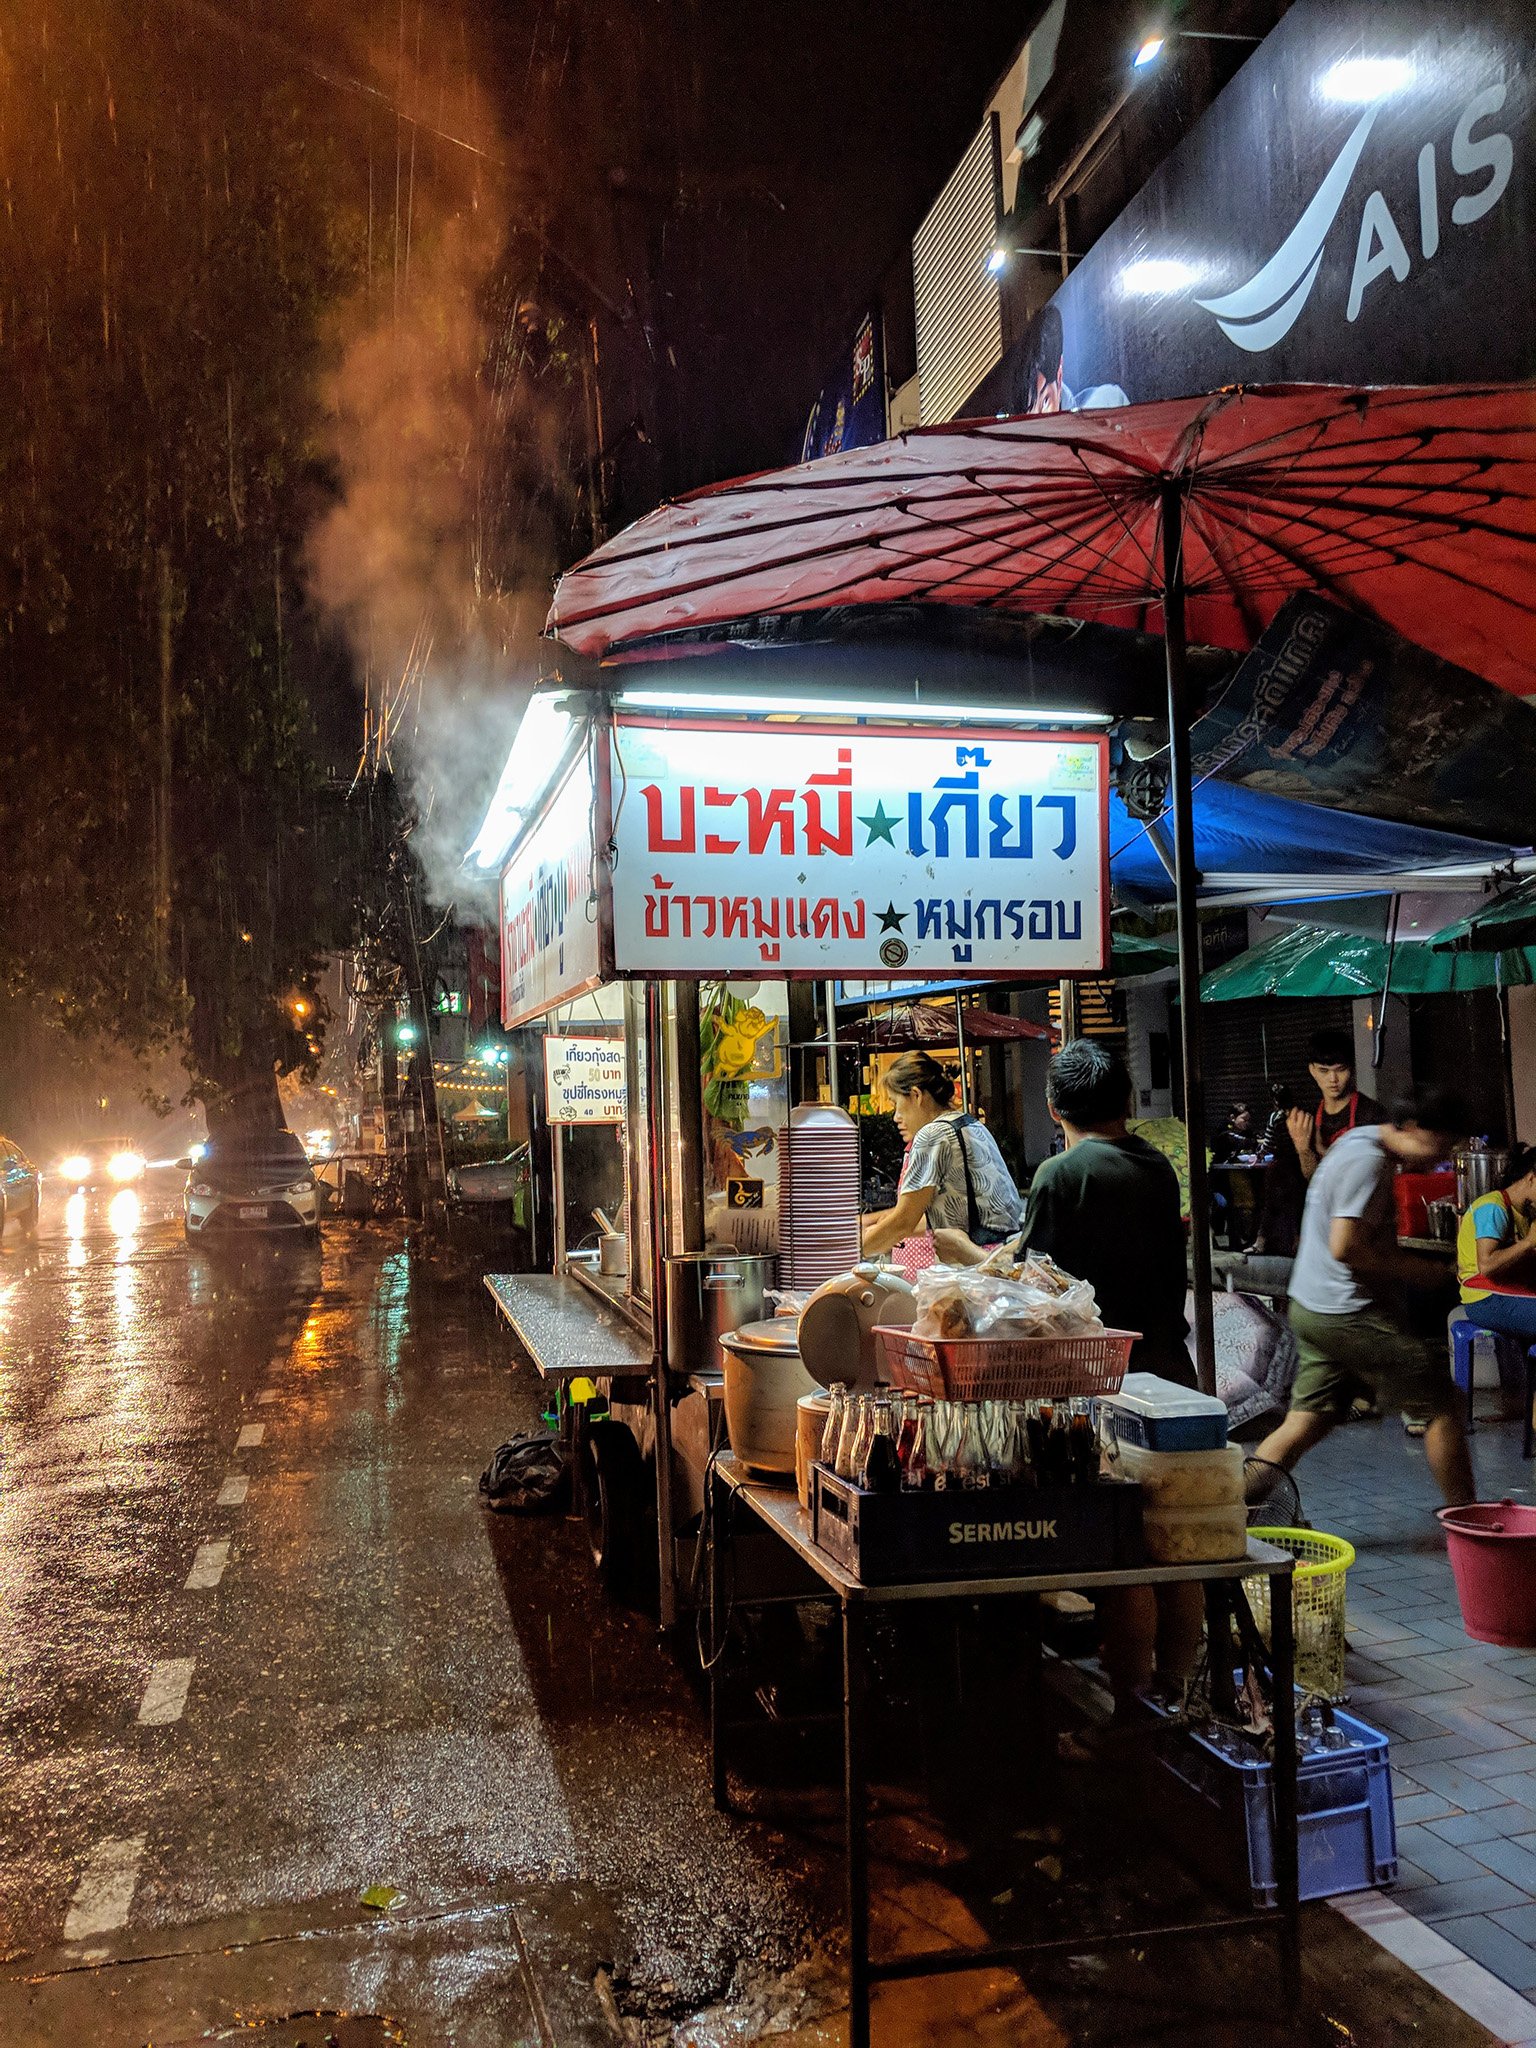 Pouring rain at Chang Phuek Gate night market